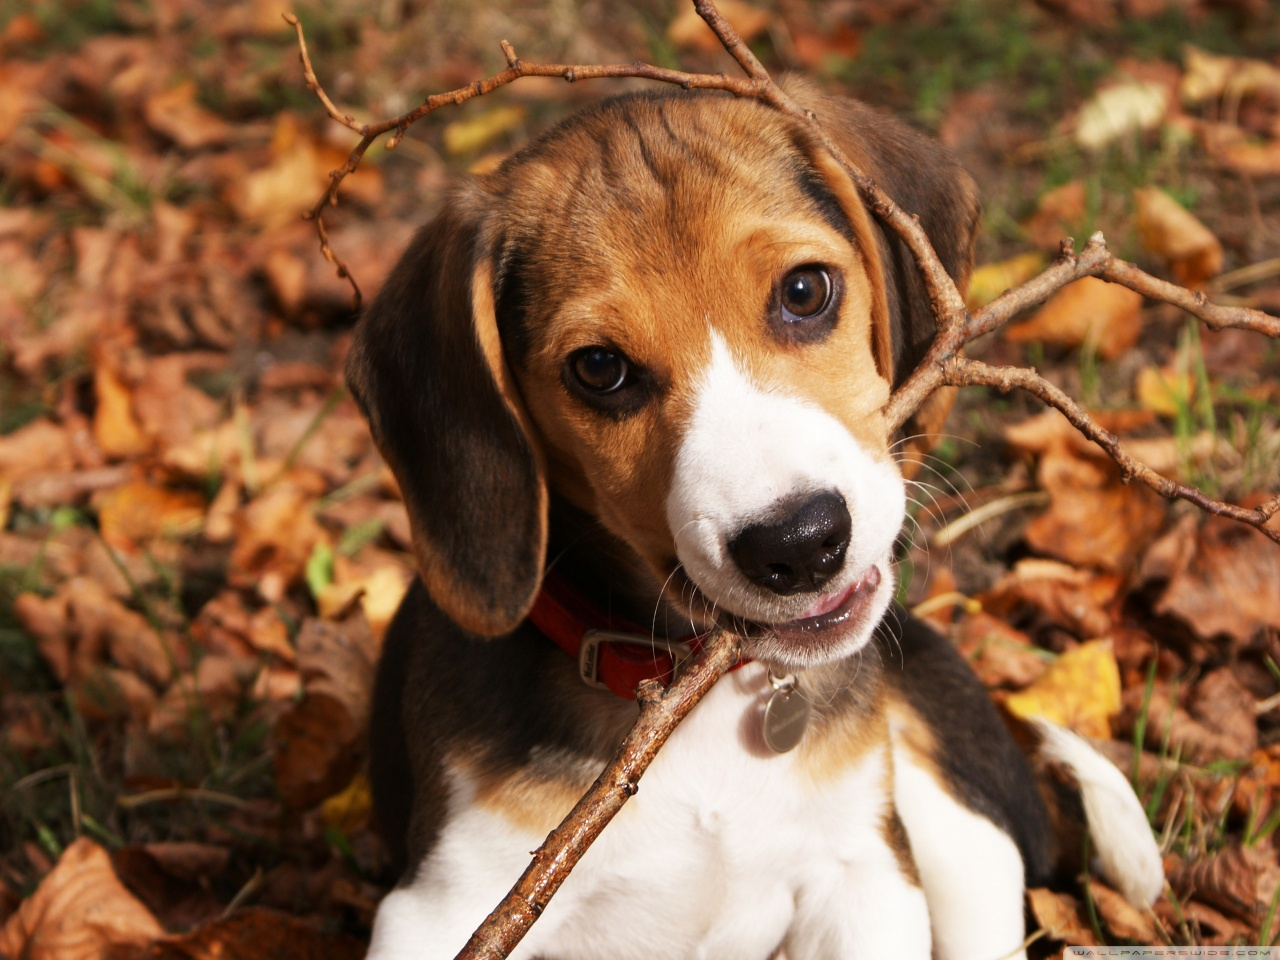 Cute Dog Wallpapers Fot Google Cute Beagle Puppy 4k Hd Desktop Wallpaper For 4k Ultra Hd